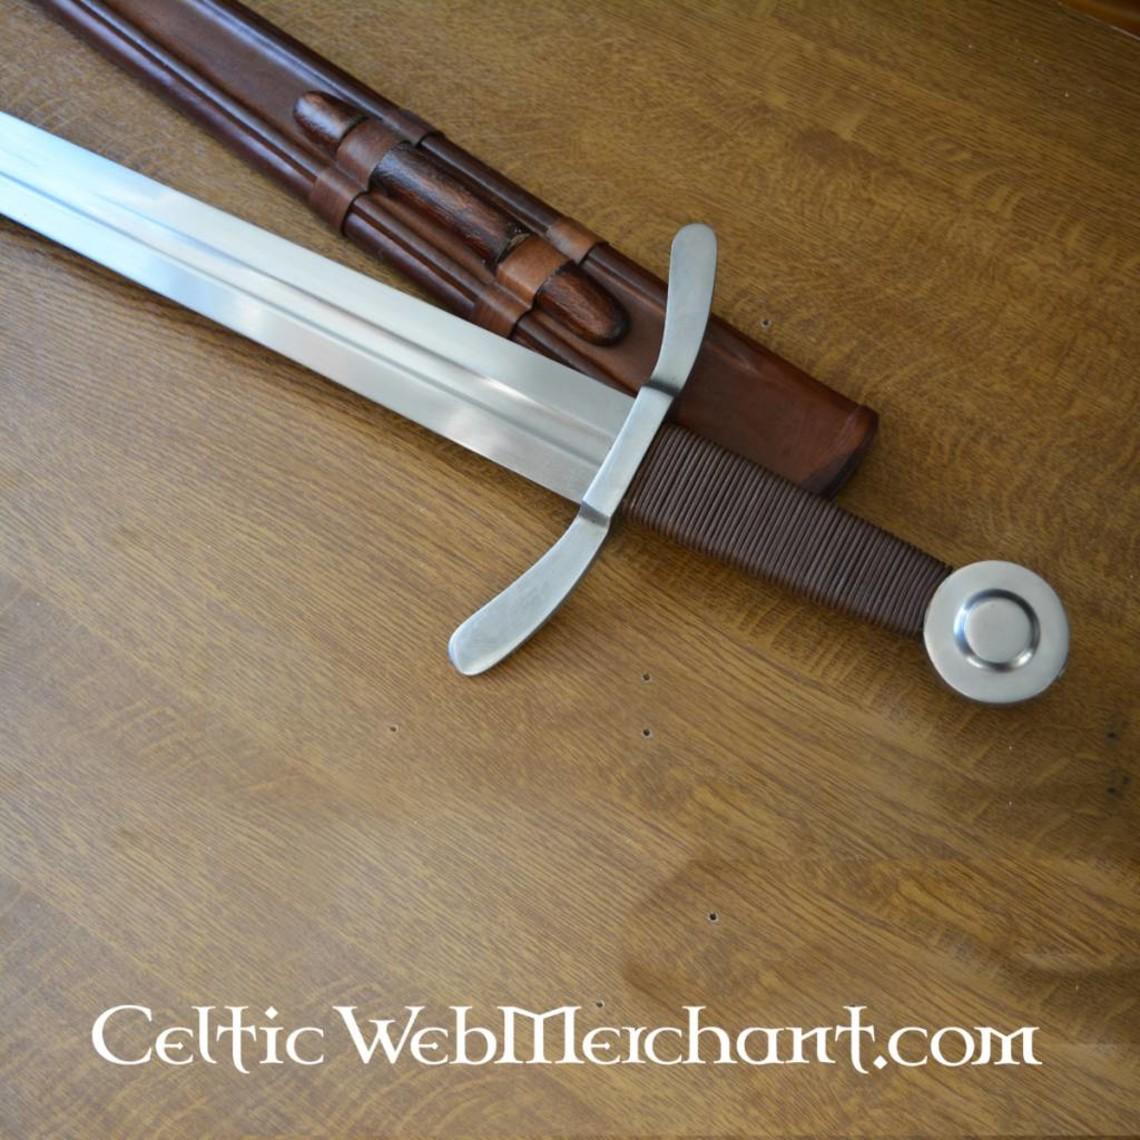 Deepeeka Medievale crociato Spada, battaglia-ready